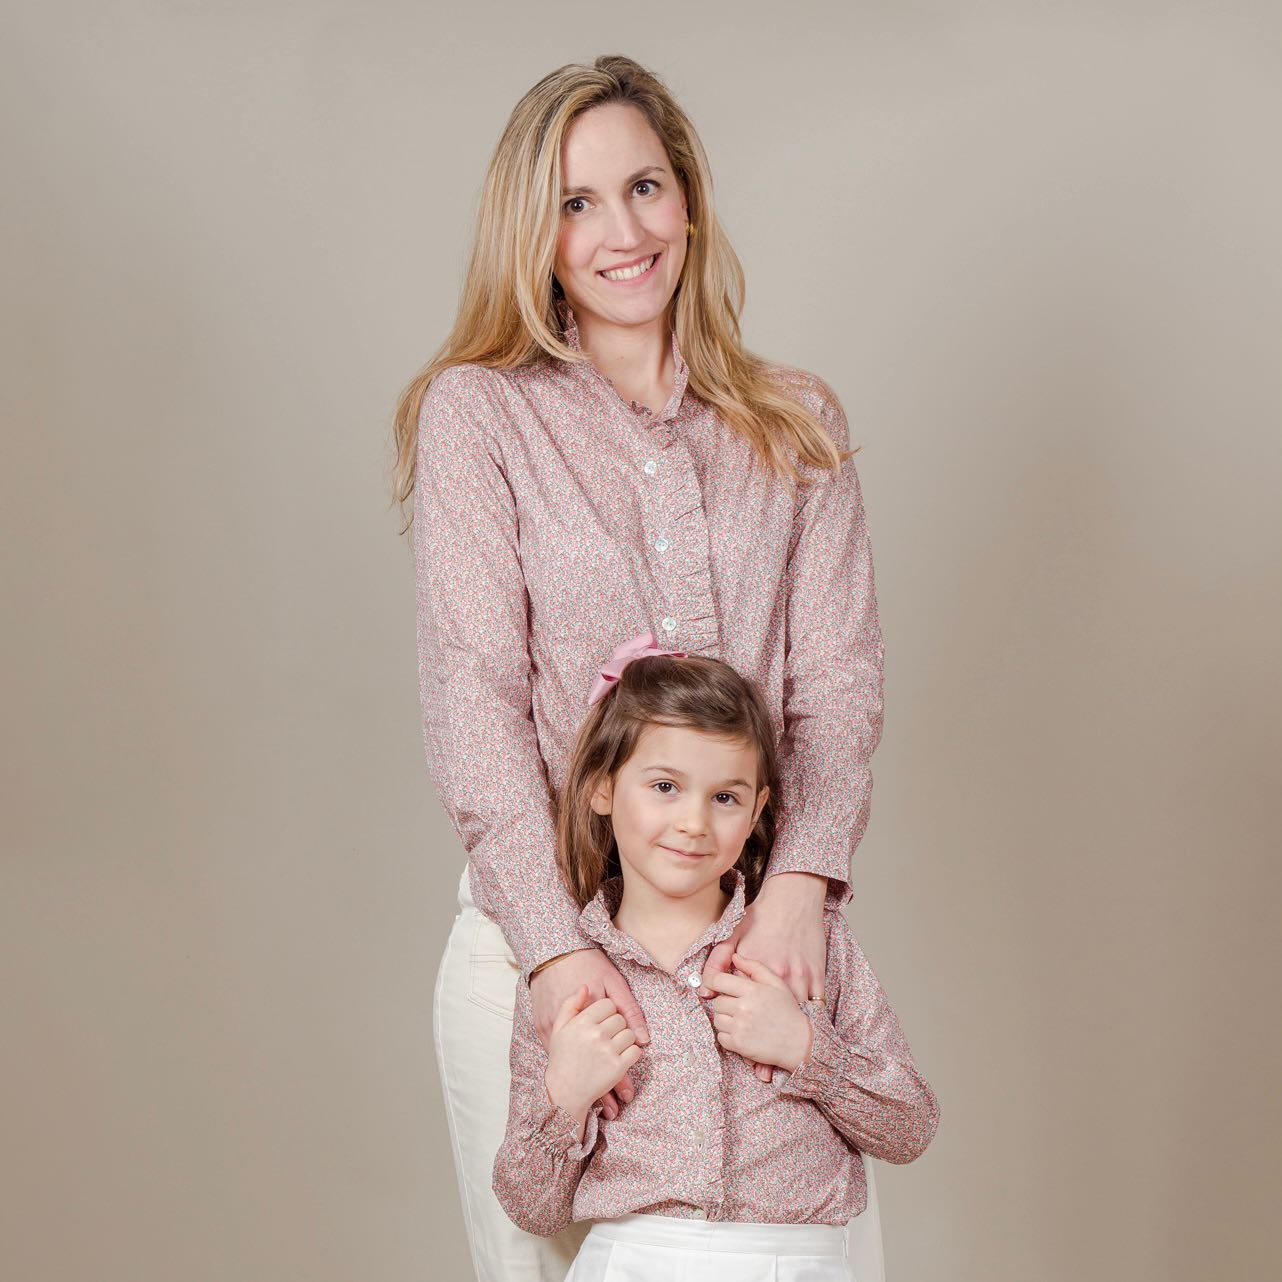 Happy Mother's Day@bonitatokyo︎ONLINE STOREhttps://bonitatokyo.com#bonitatokyo #amaiakids #アマイアキッズ #シャーロット王女 #キャサリン妃 #リバティプリント #プレママ #母の日 #マスク #母娘コーデ #サブバッグ